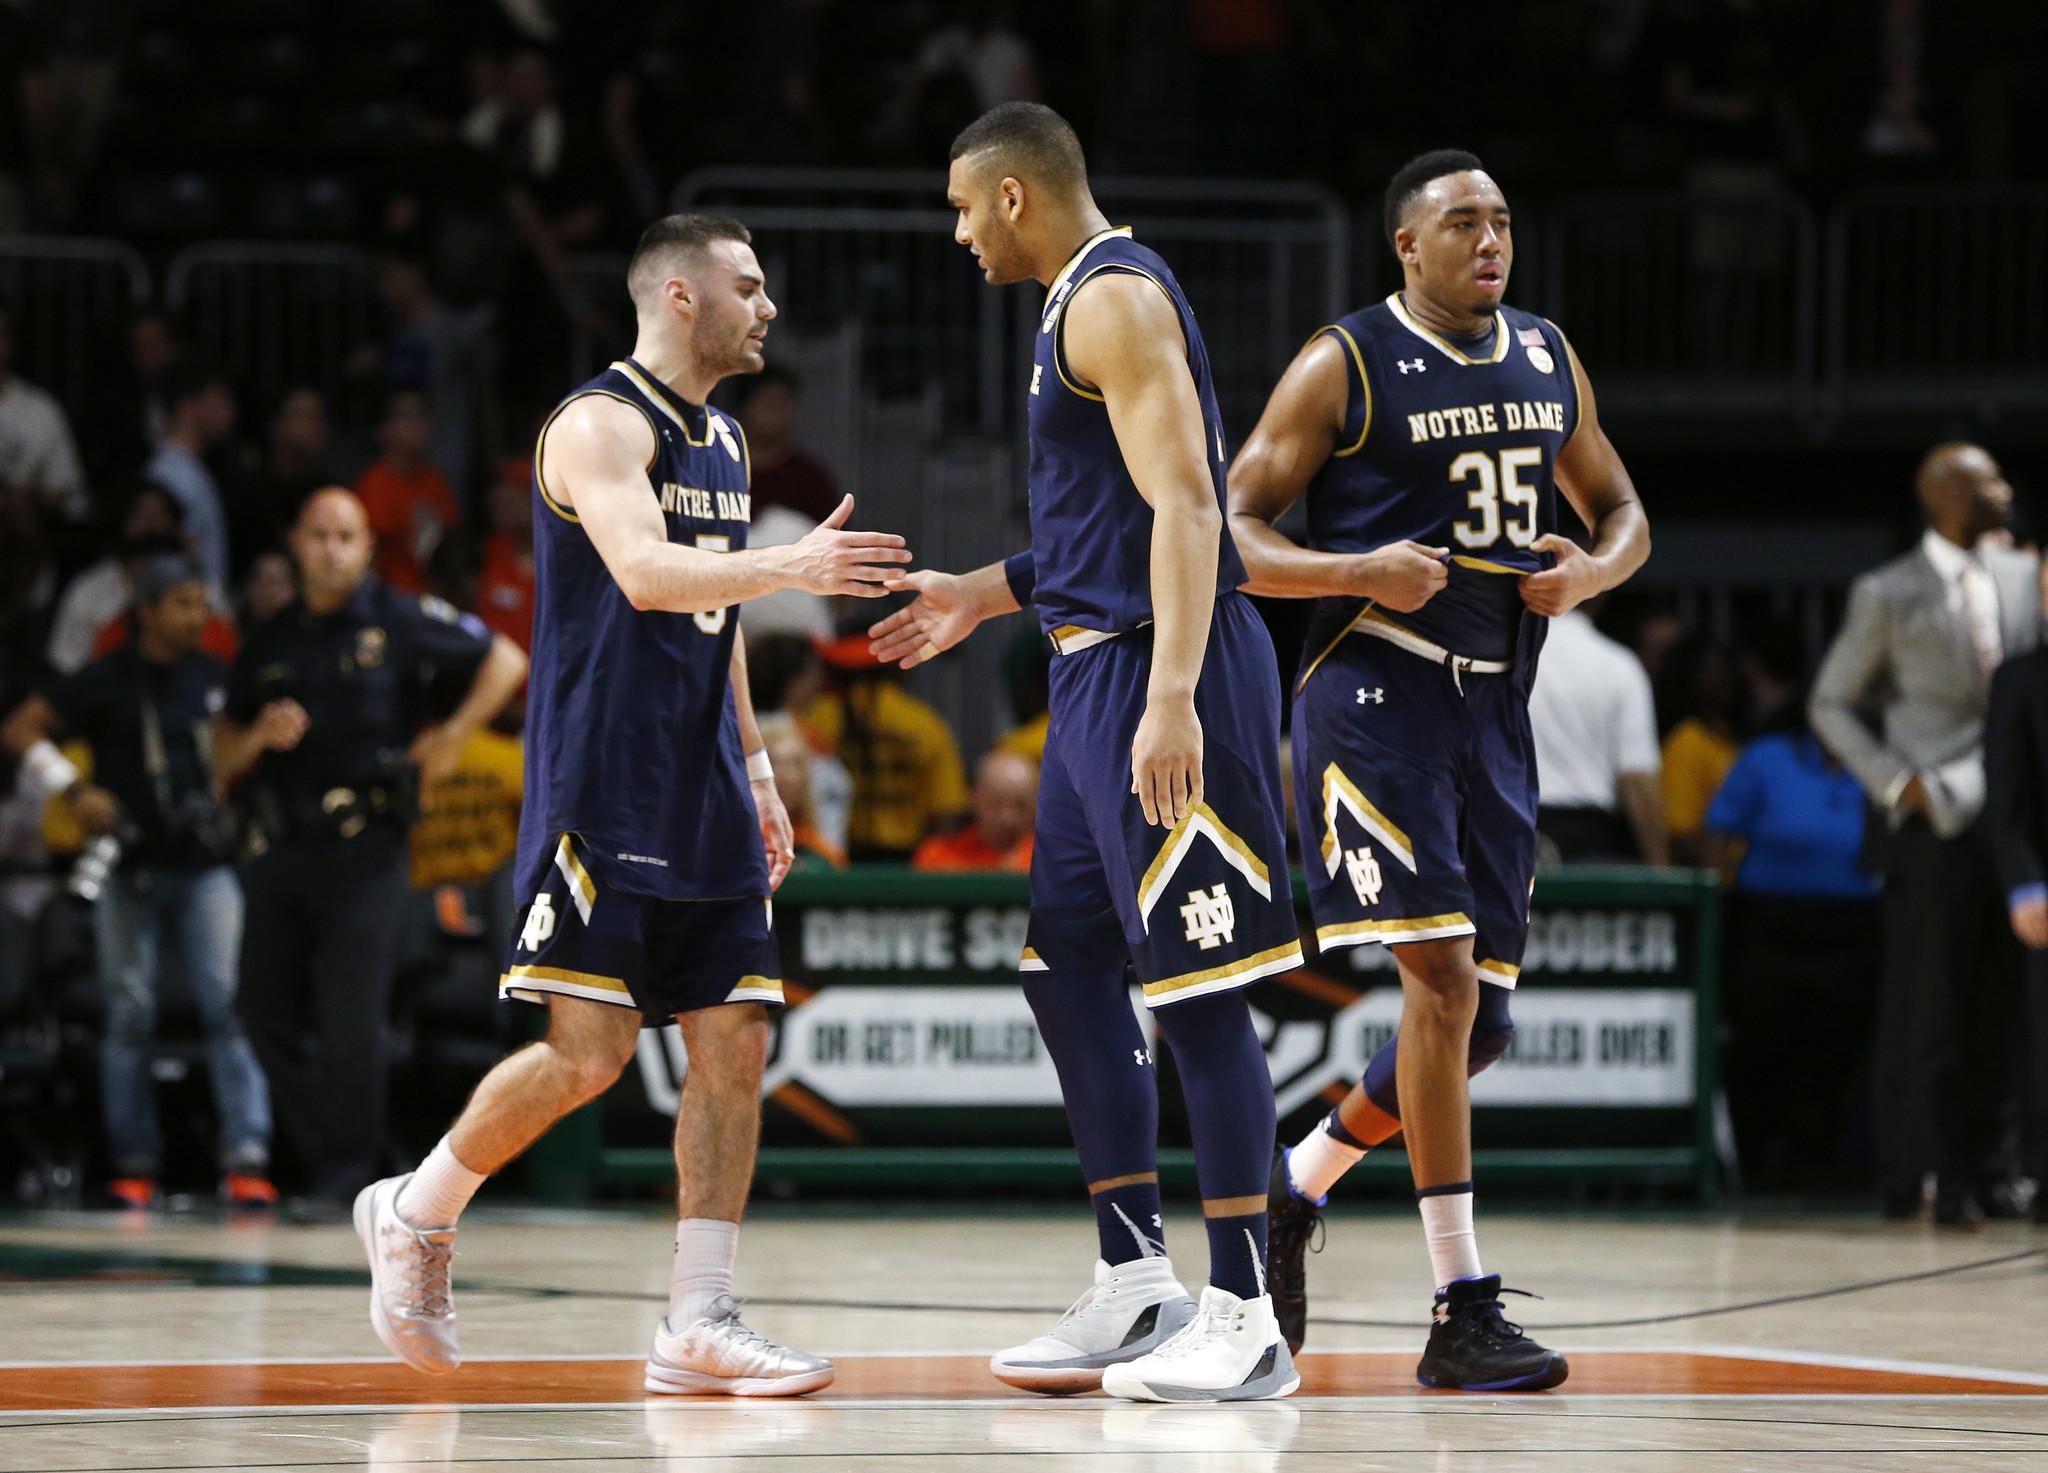 Ct-college-basketball-roundup-20170112